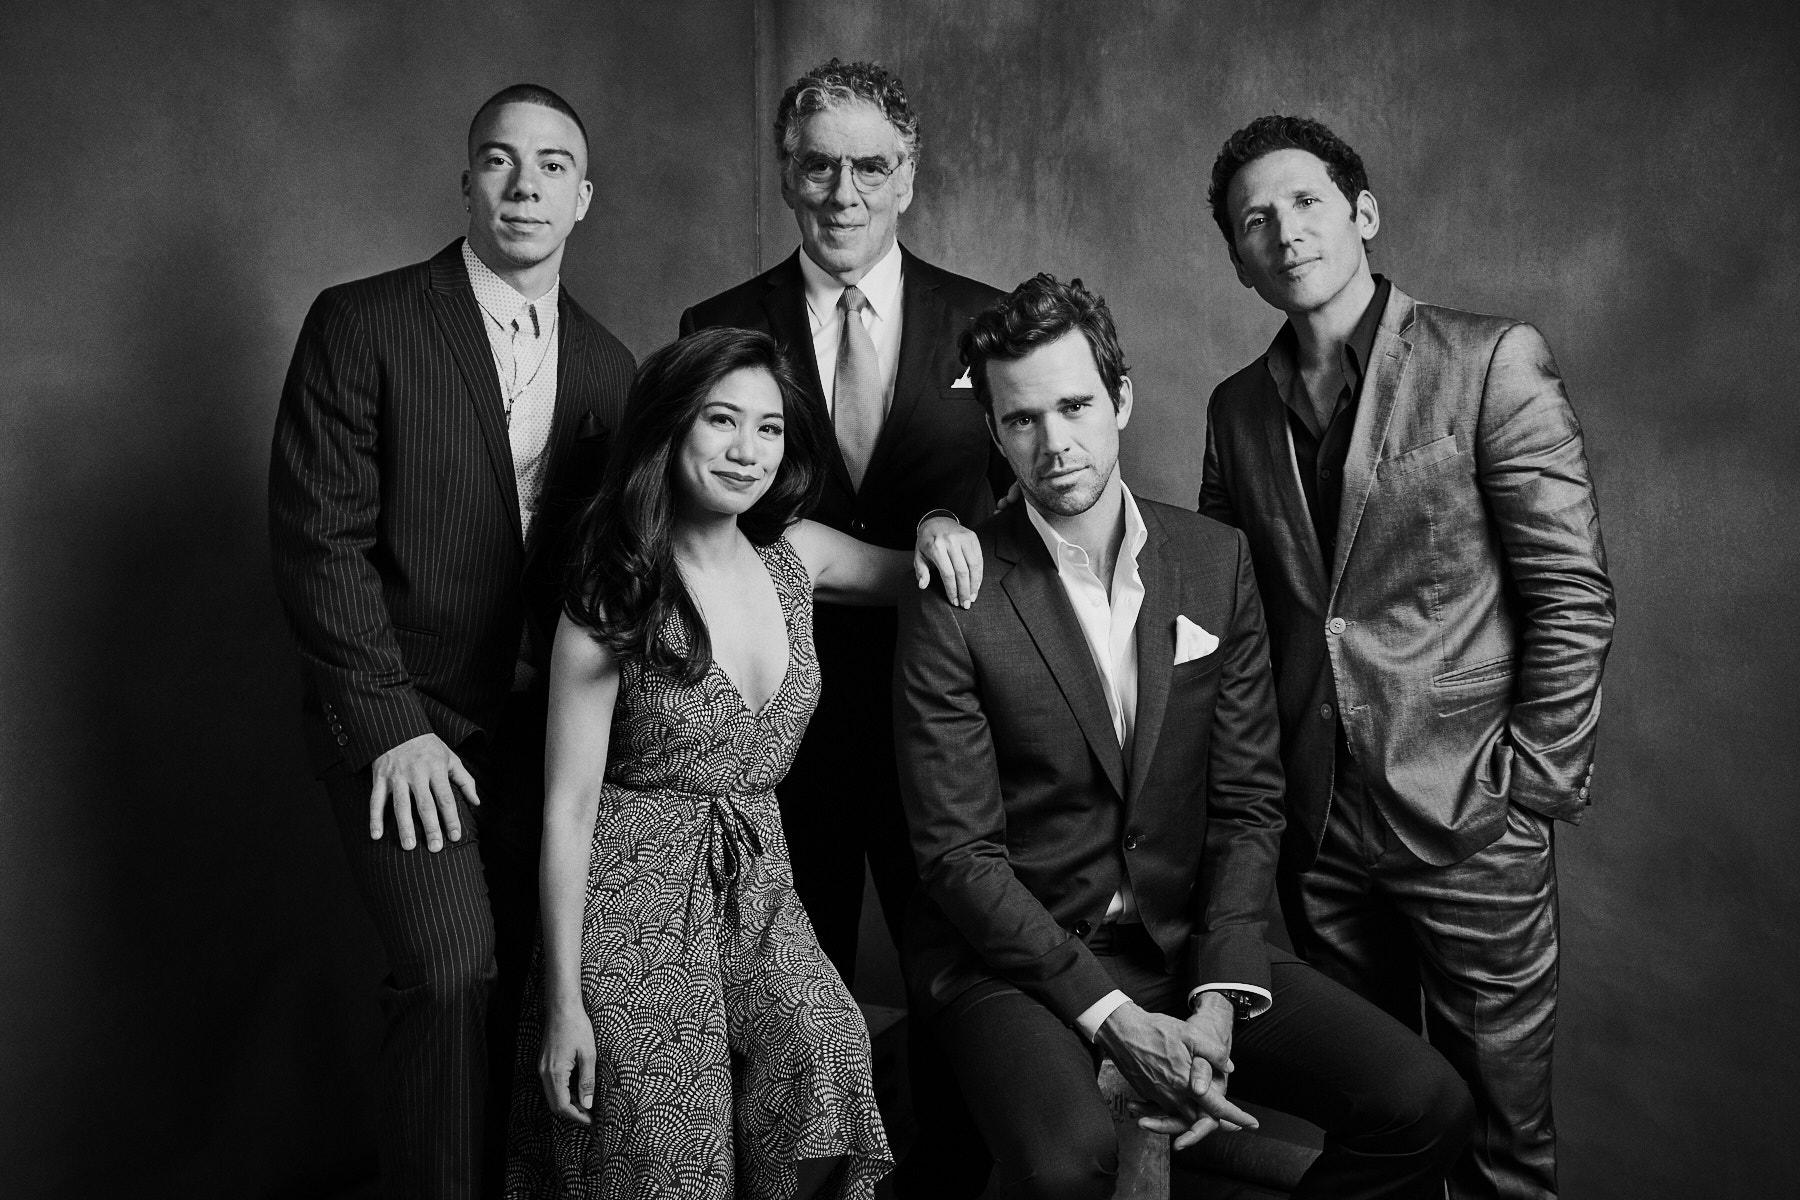 The cast of 9JKL